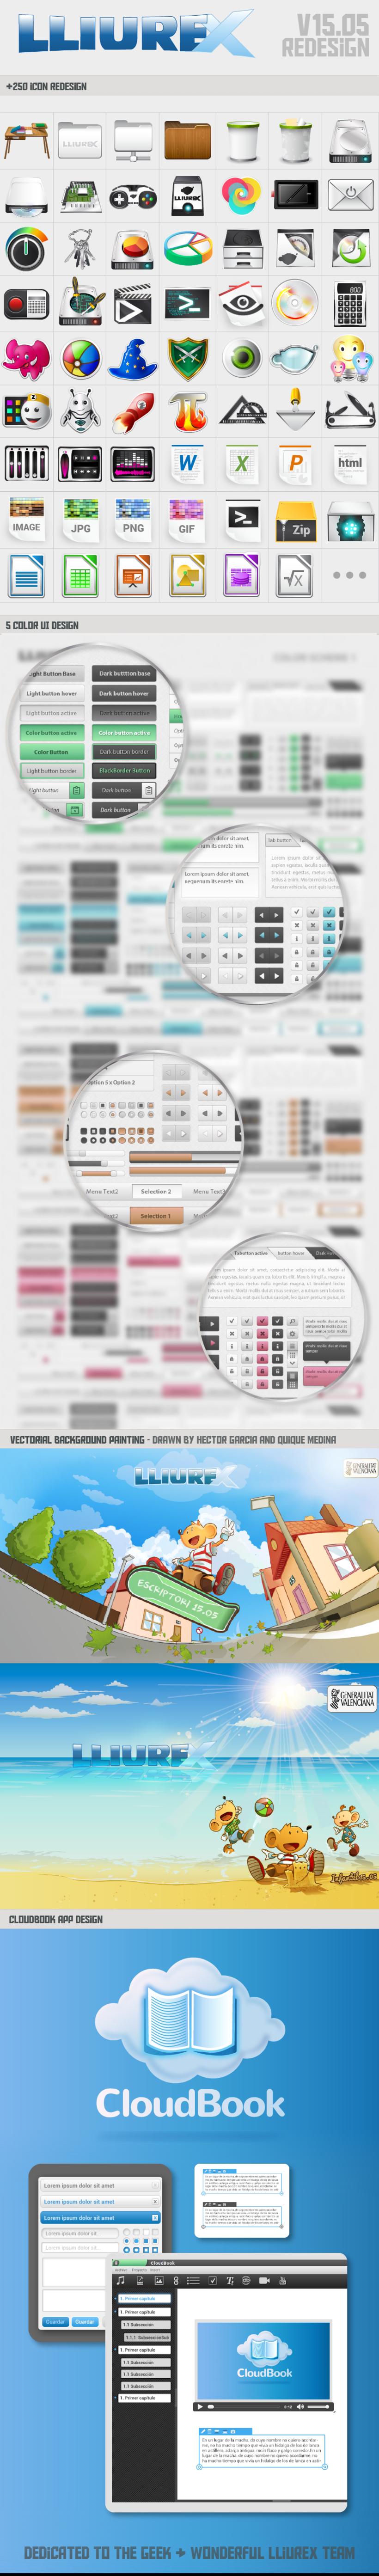 LLIUREX V15.05 OS DESIGN 0